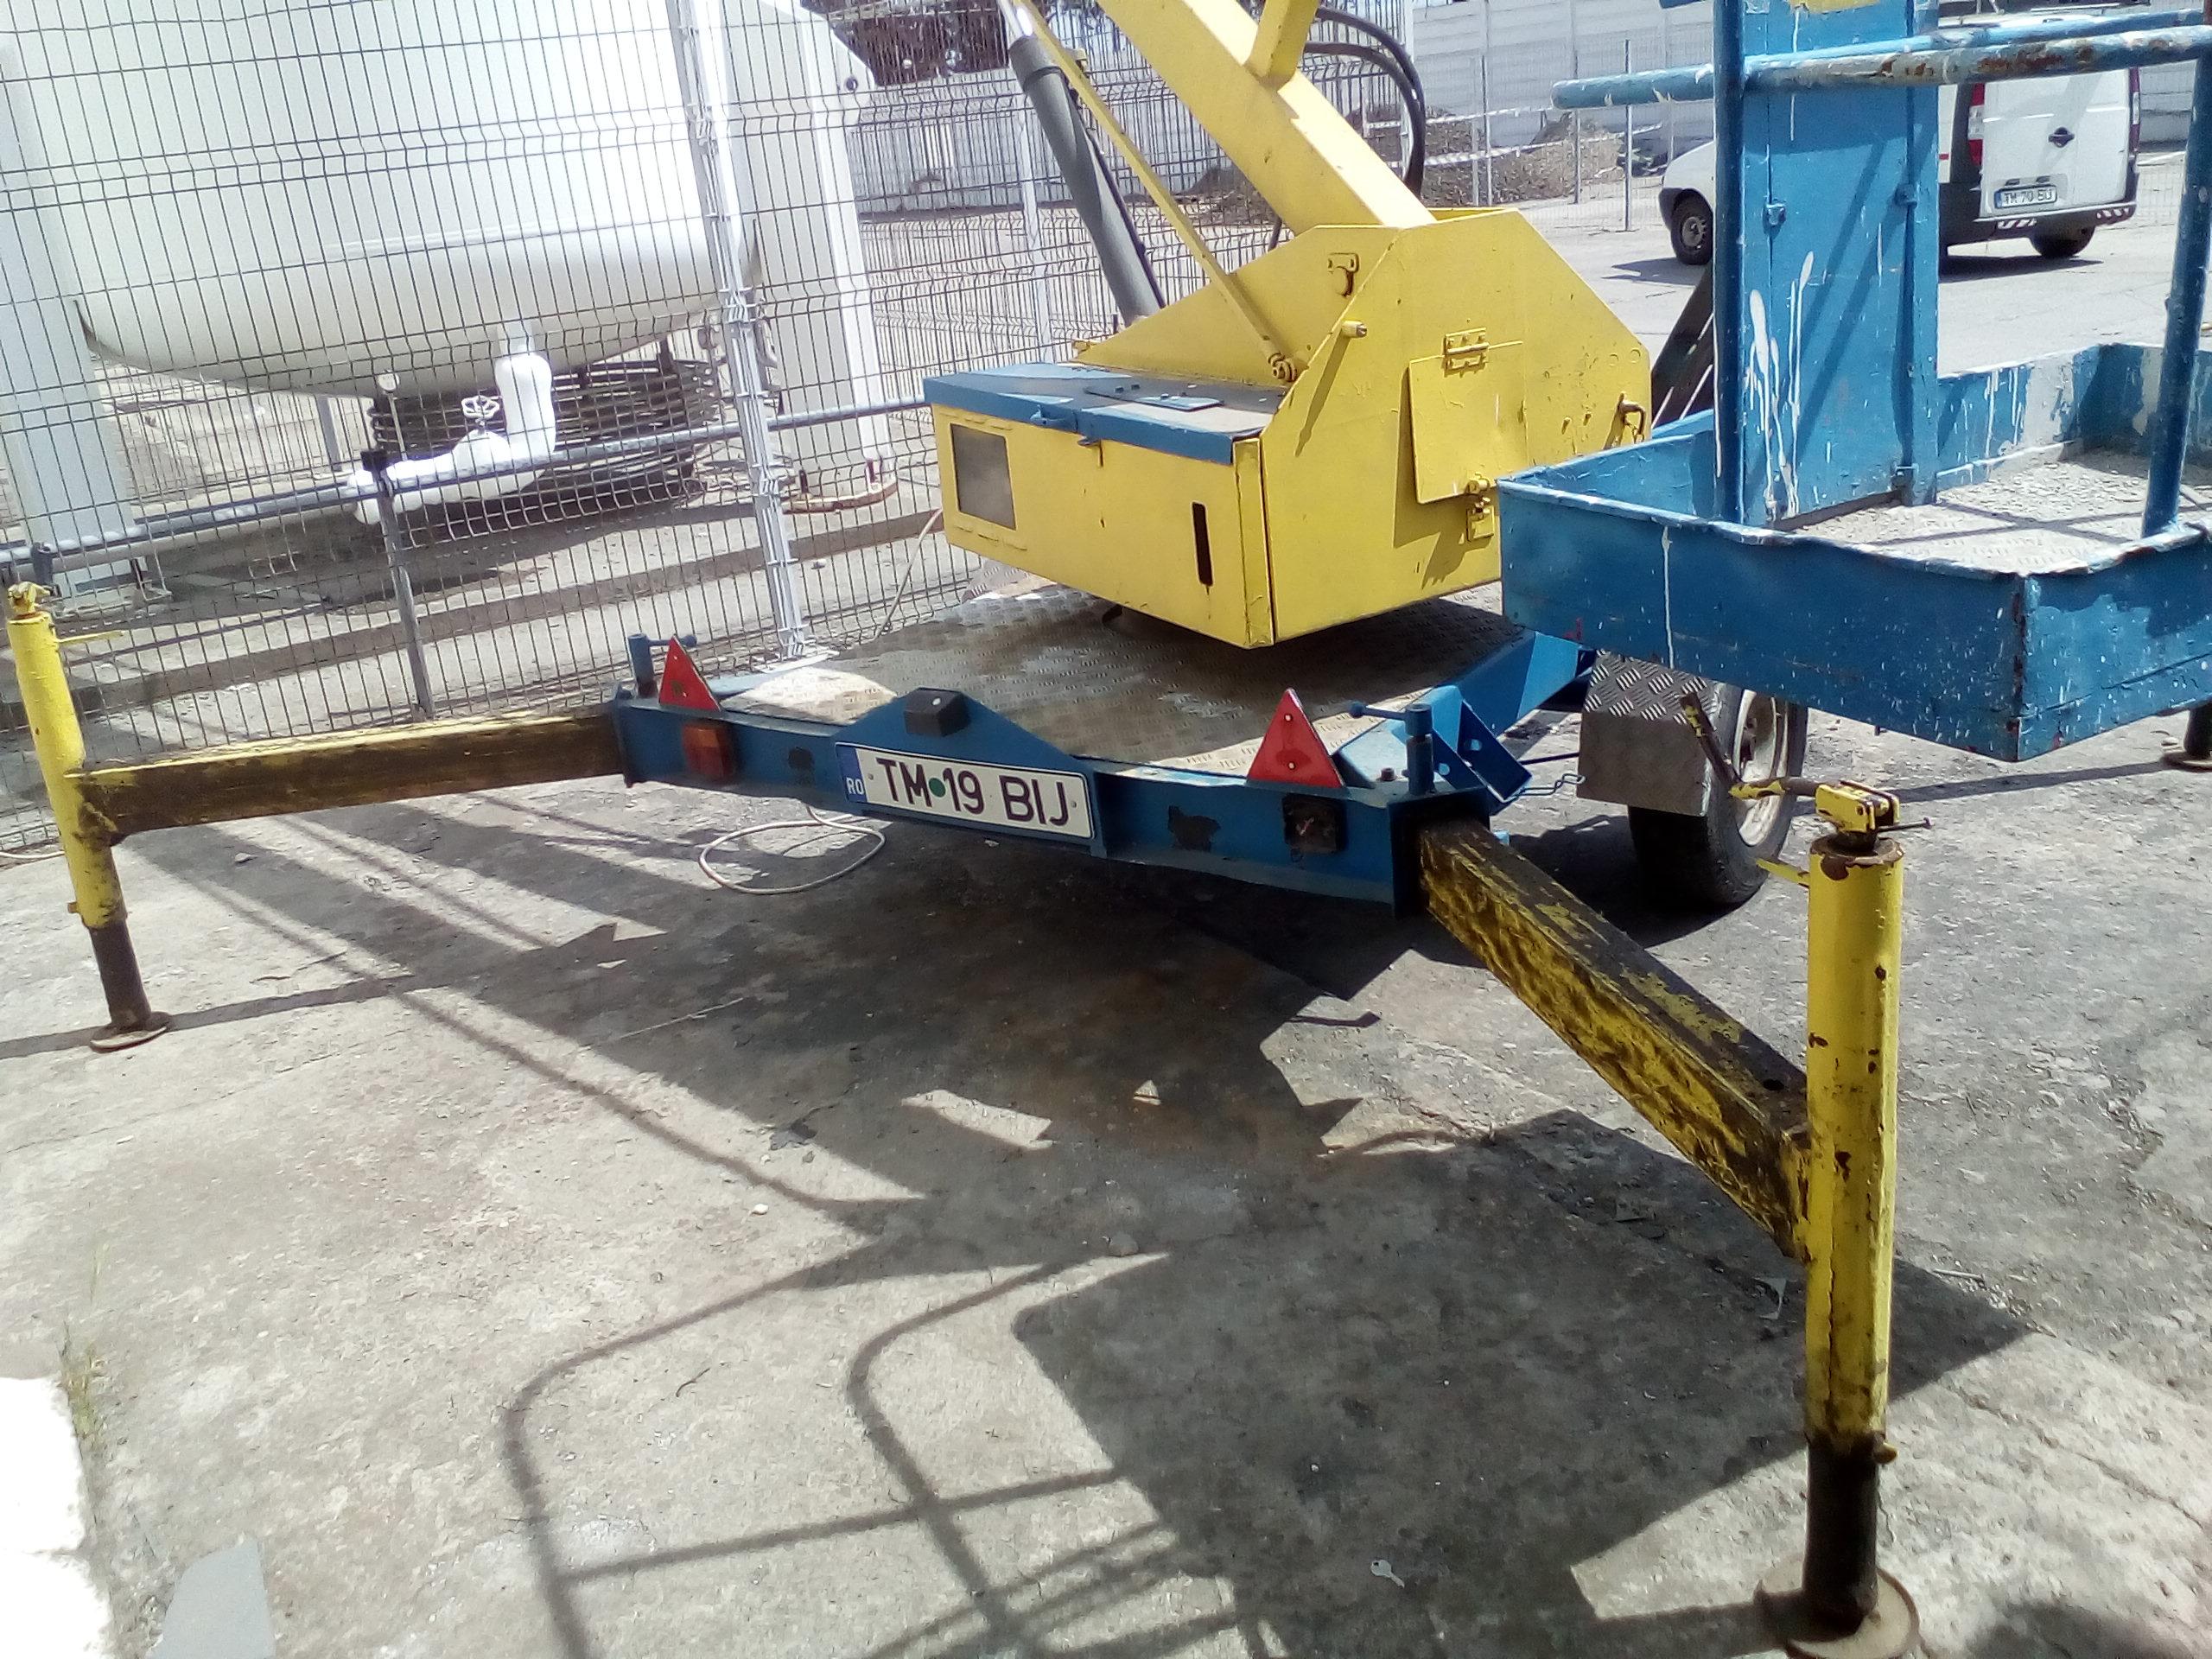 MASINA MACARA PRB OHMME 12000FR nr. inmatriculare TM-19-BIJ